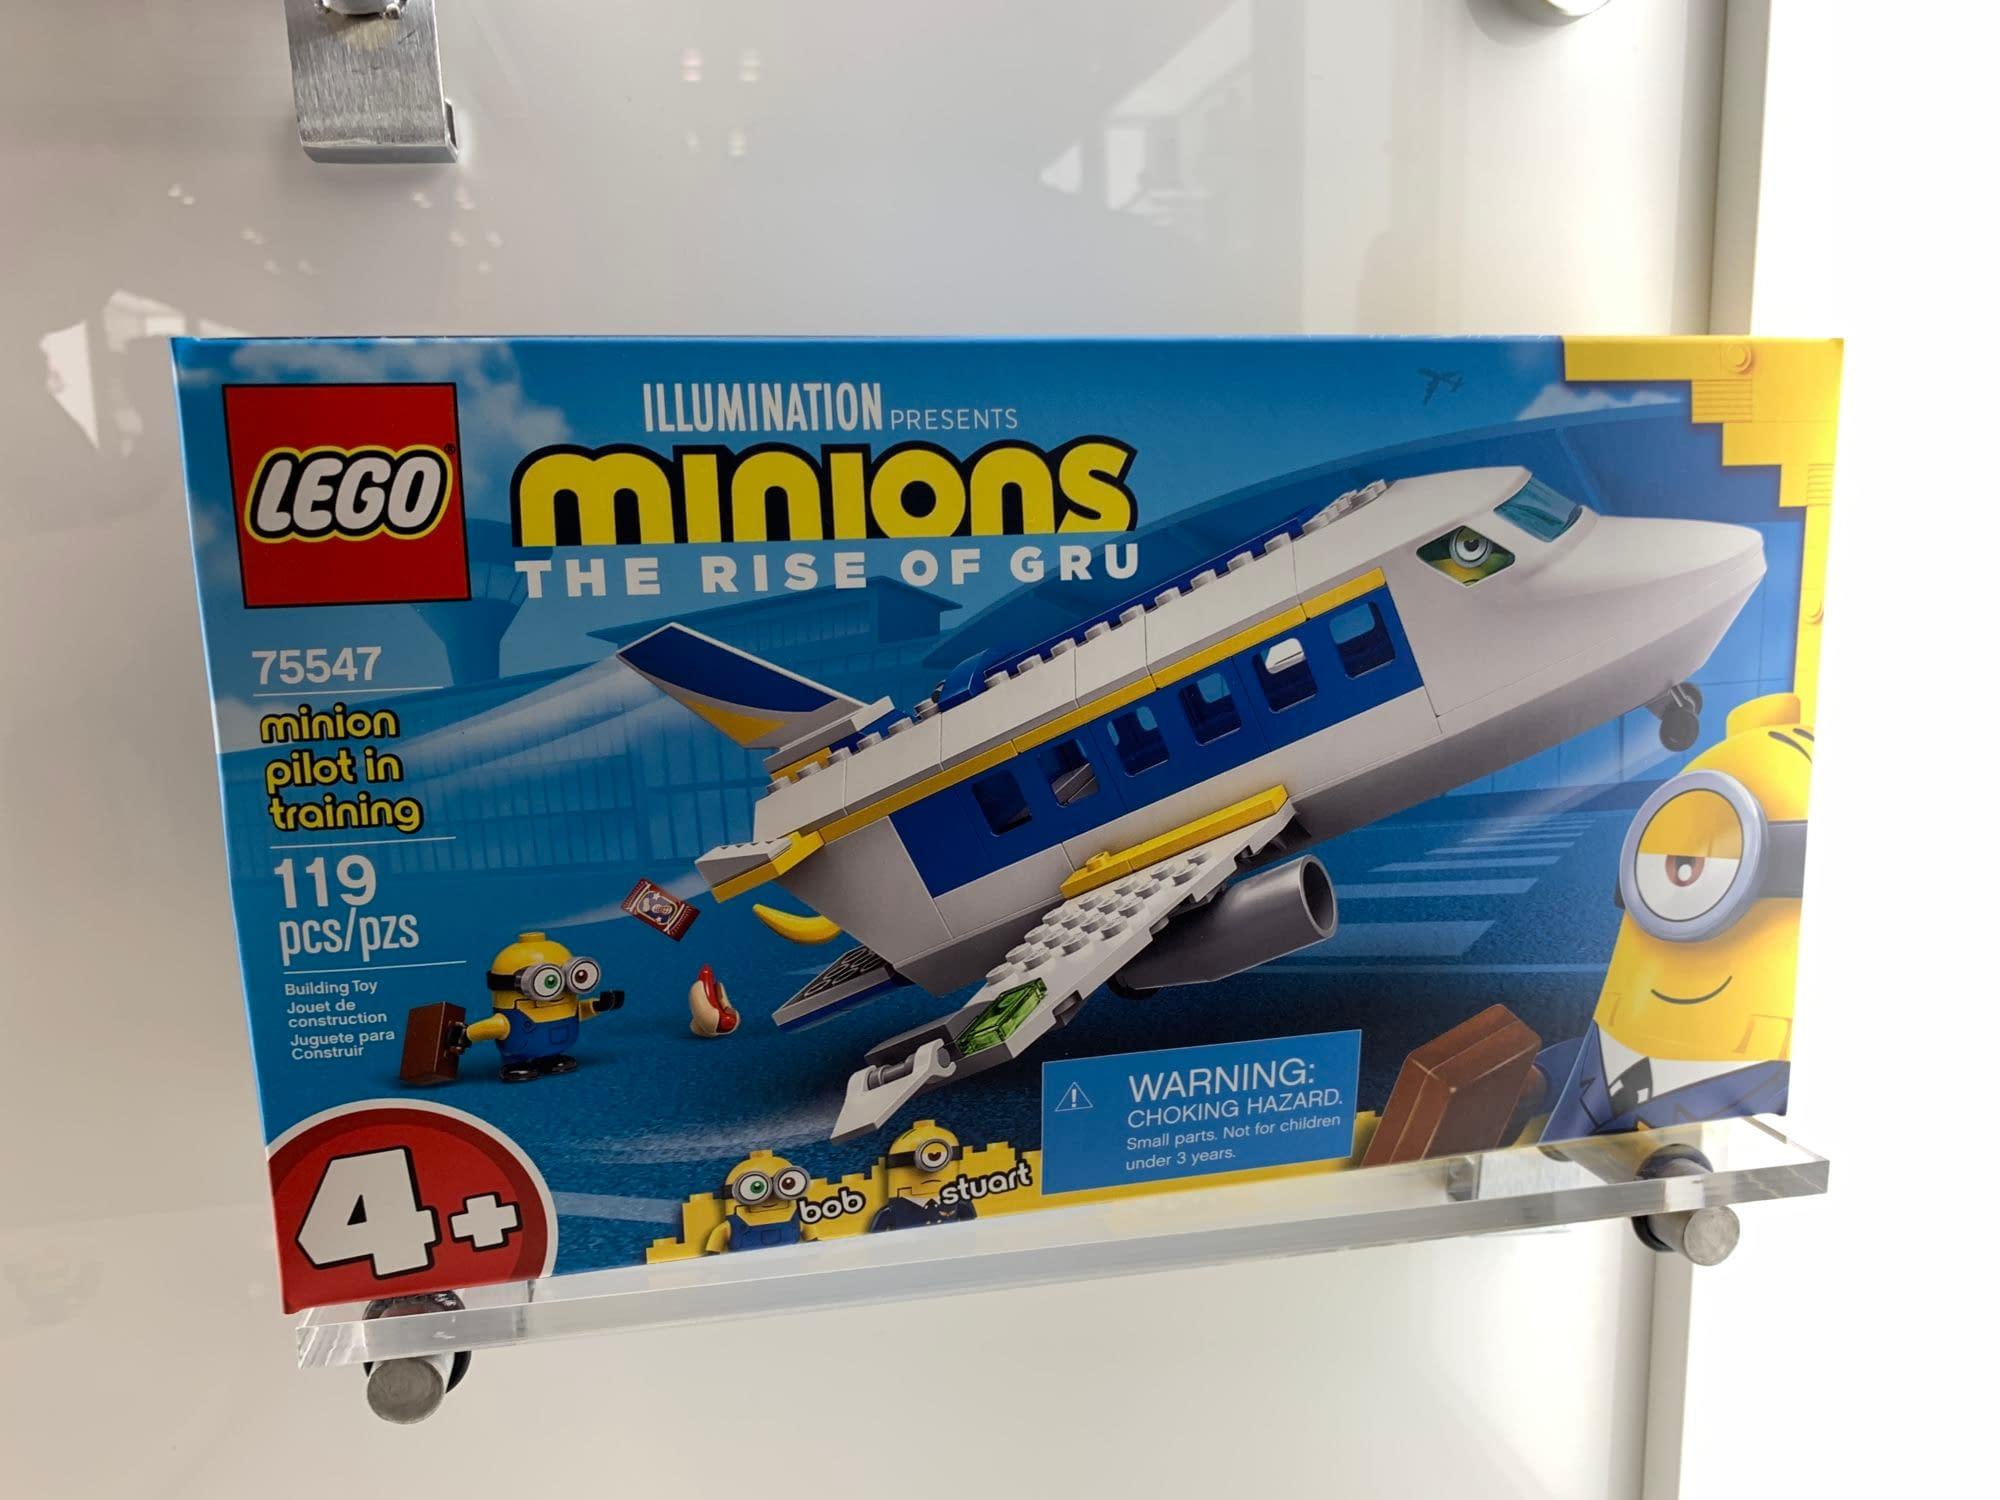 New York Toy Fair 55 Photos From The Lego Booth